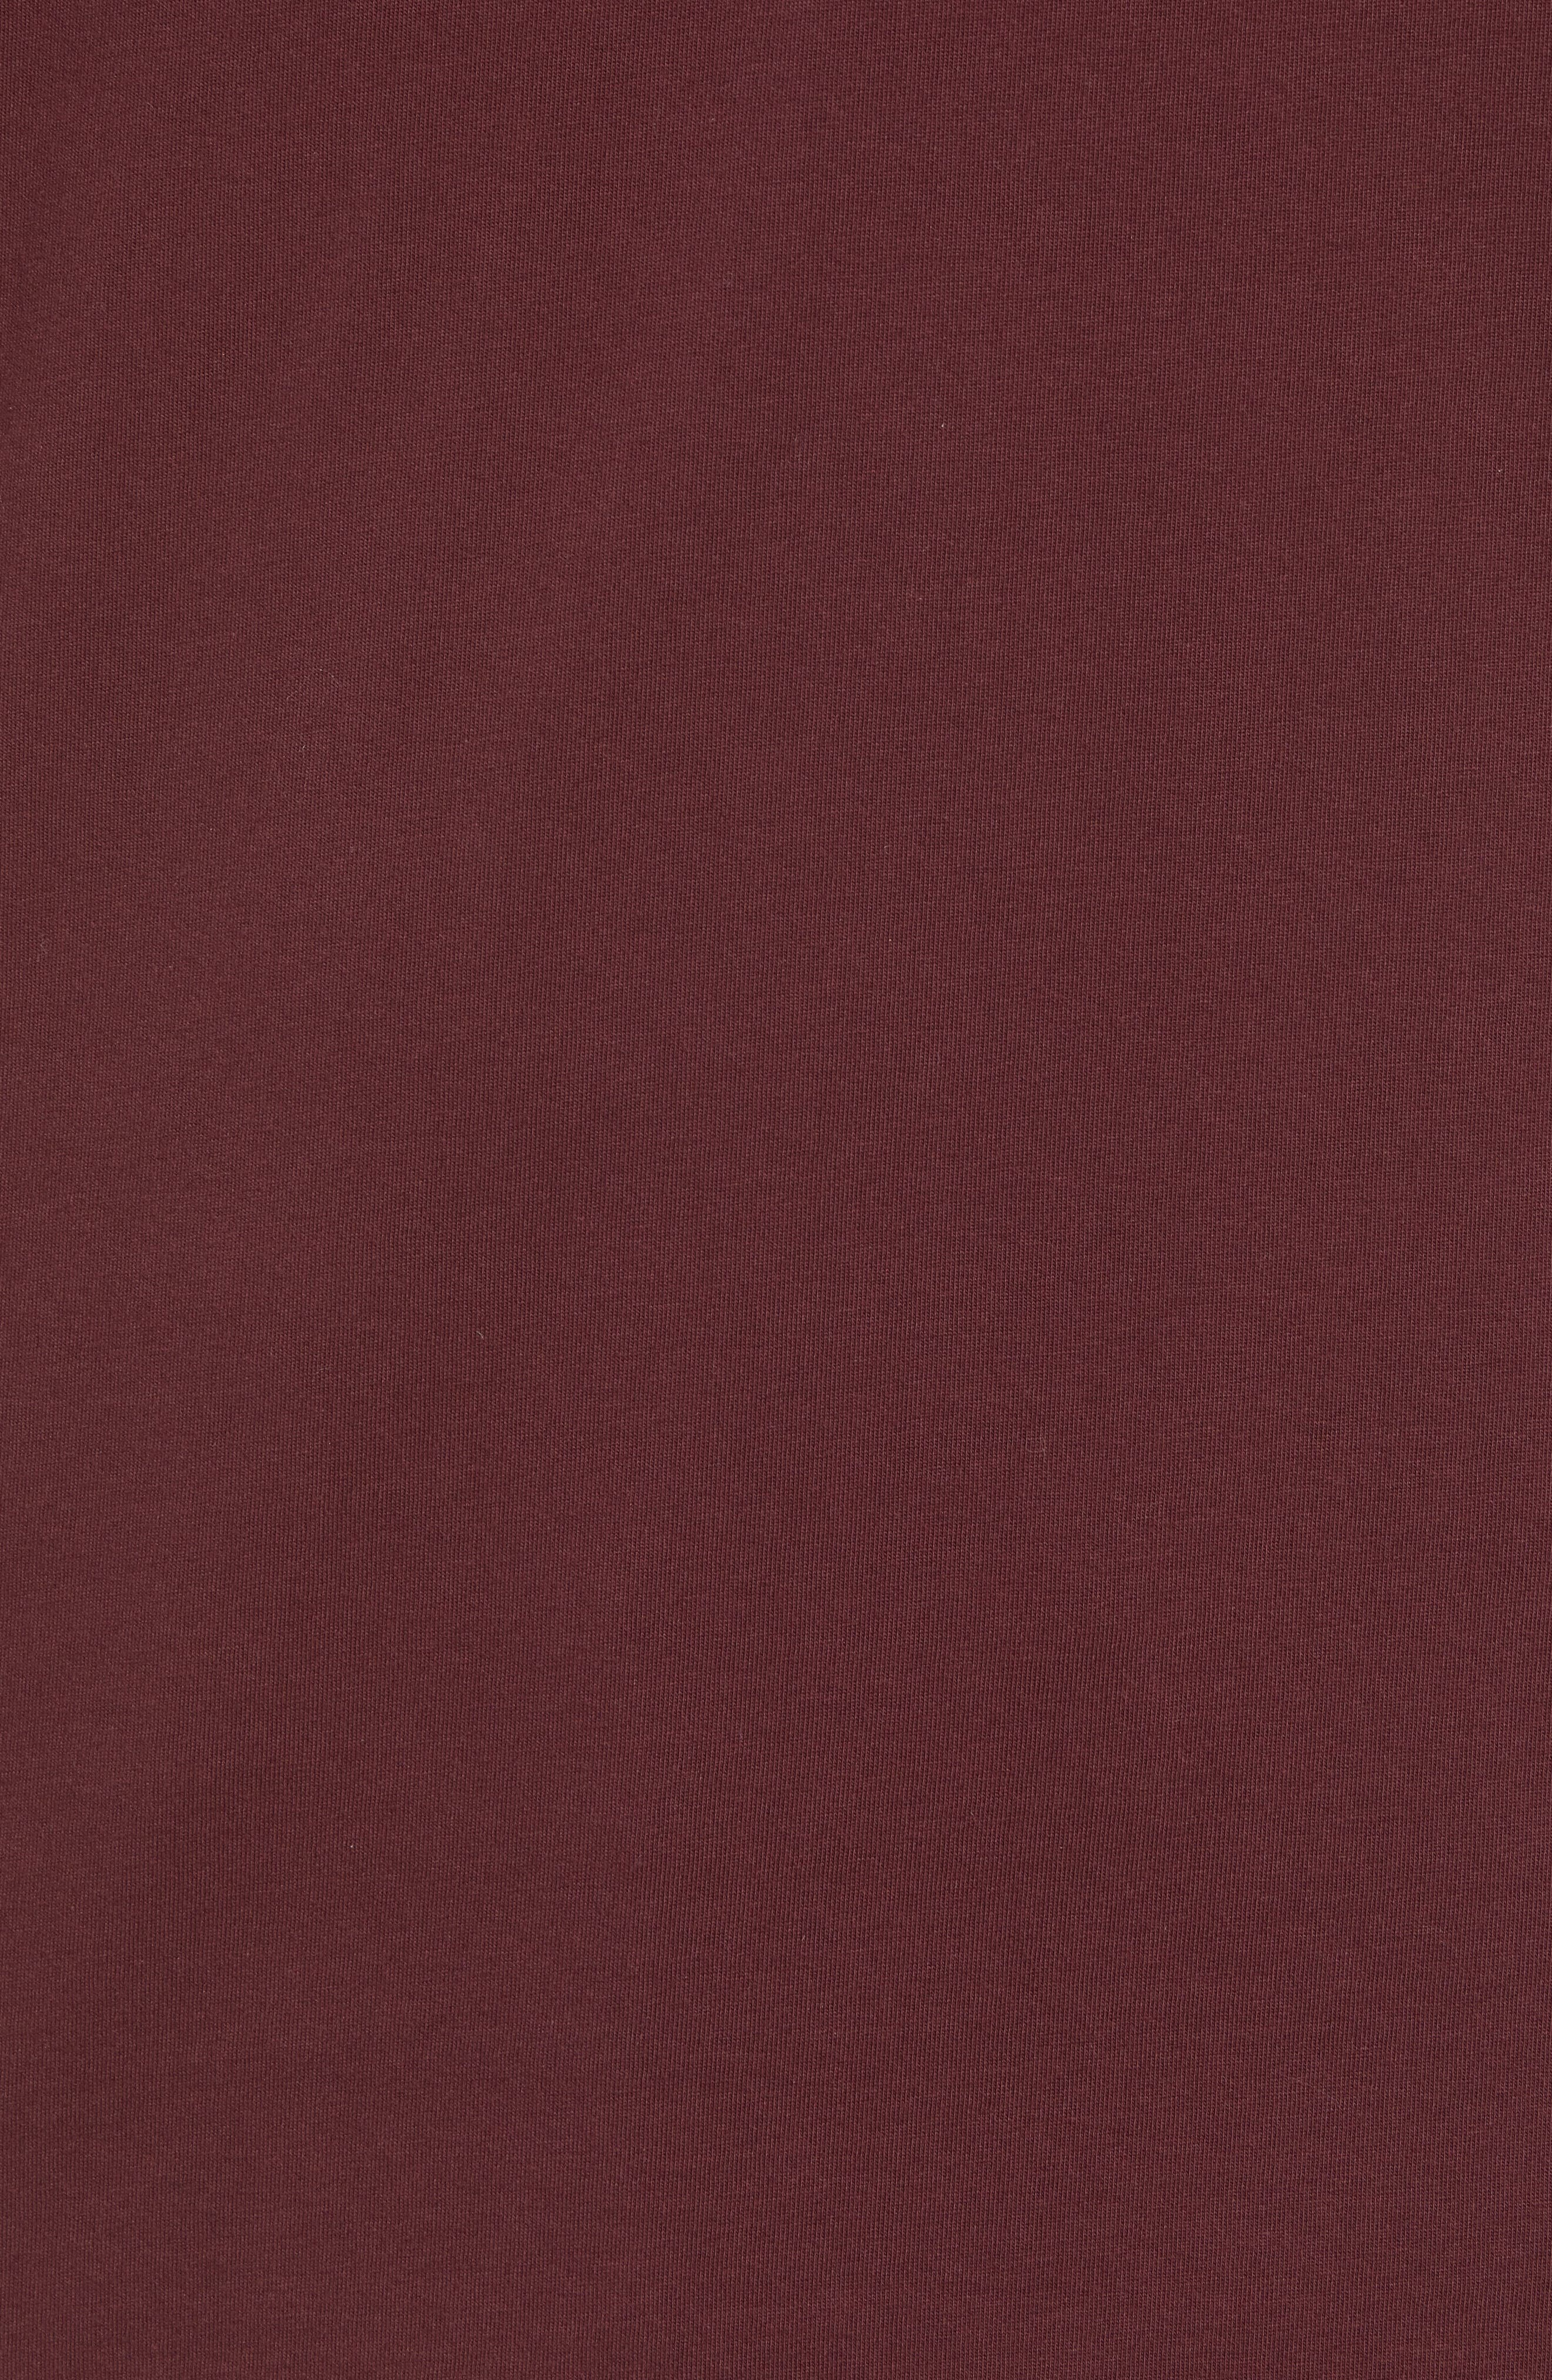 Crewneck T-Shirt,                             Alternate thumbnail 5, color,                             BURGUNDY CRUSH/ HABANERO RED